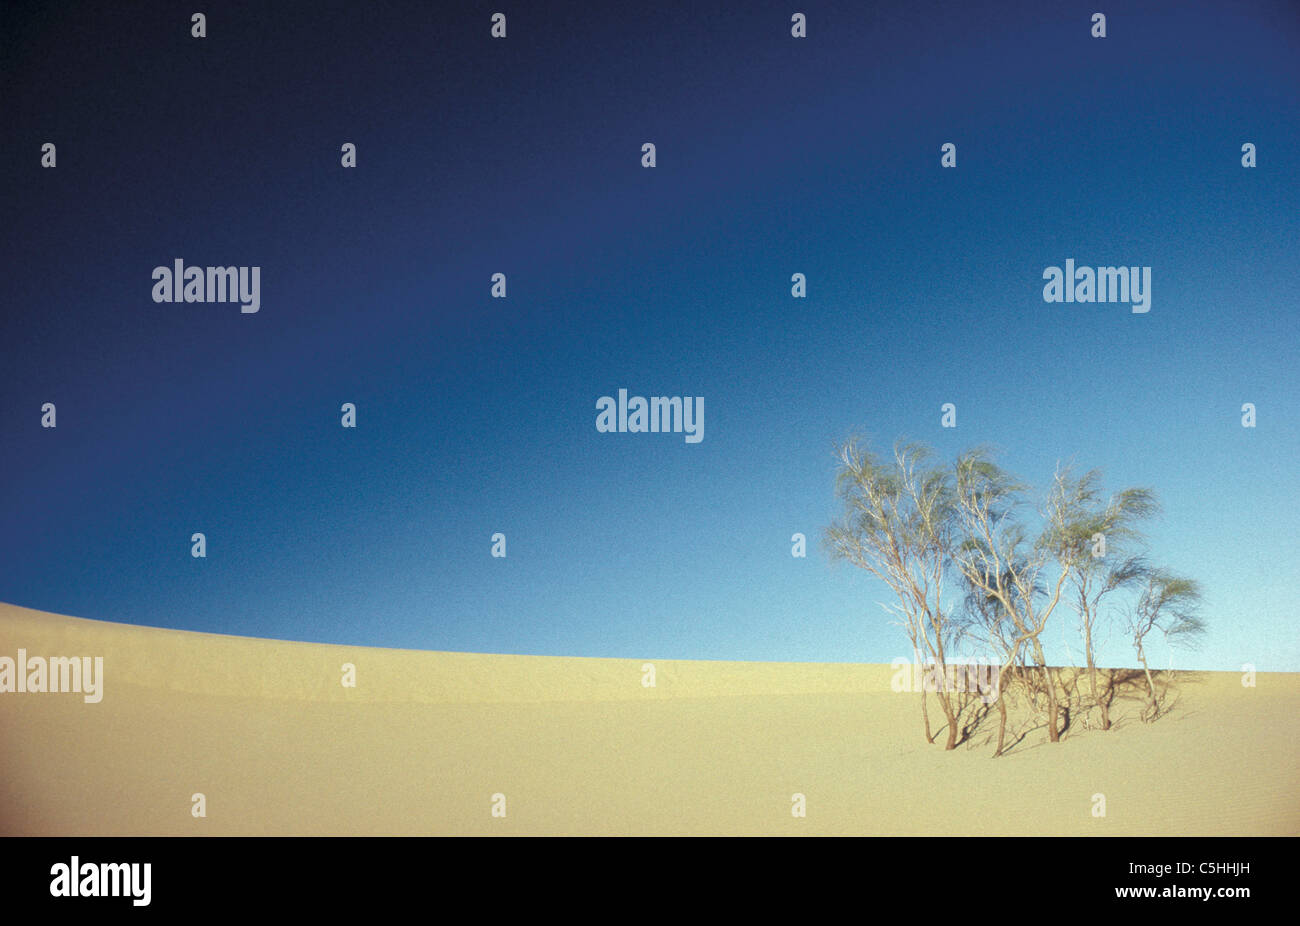 Algeria. Deb Deb. Sahara desert. Bushes on sanddunes. Stock Photo